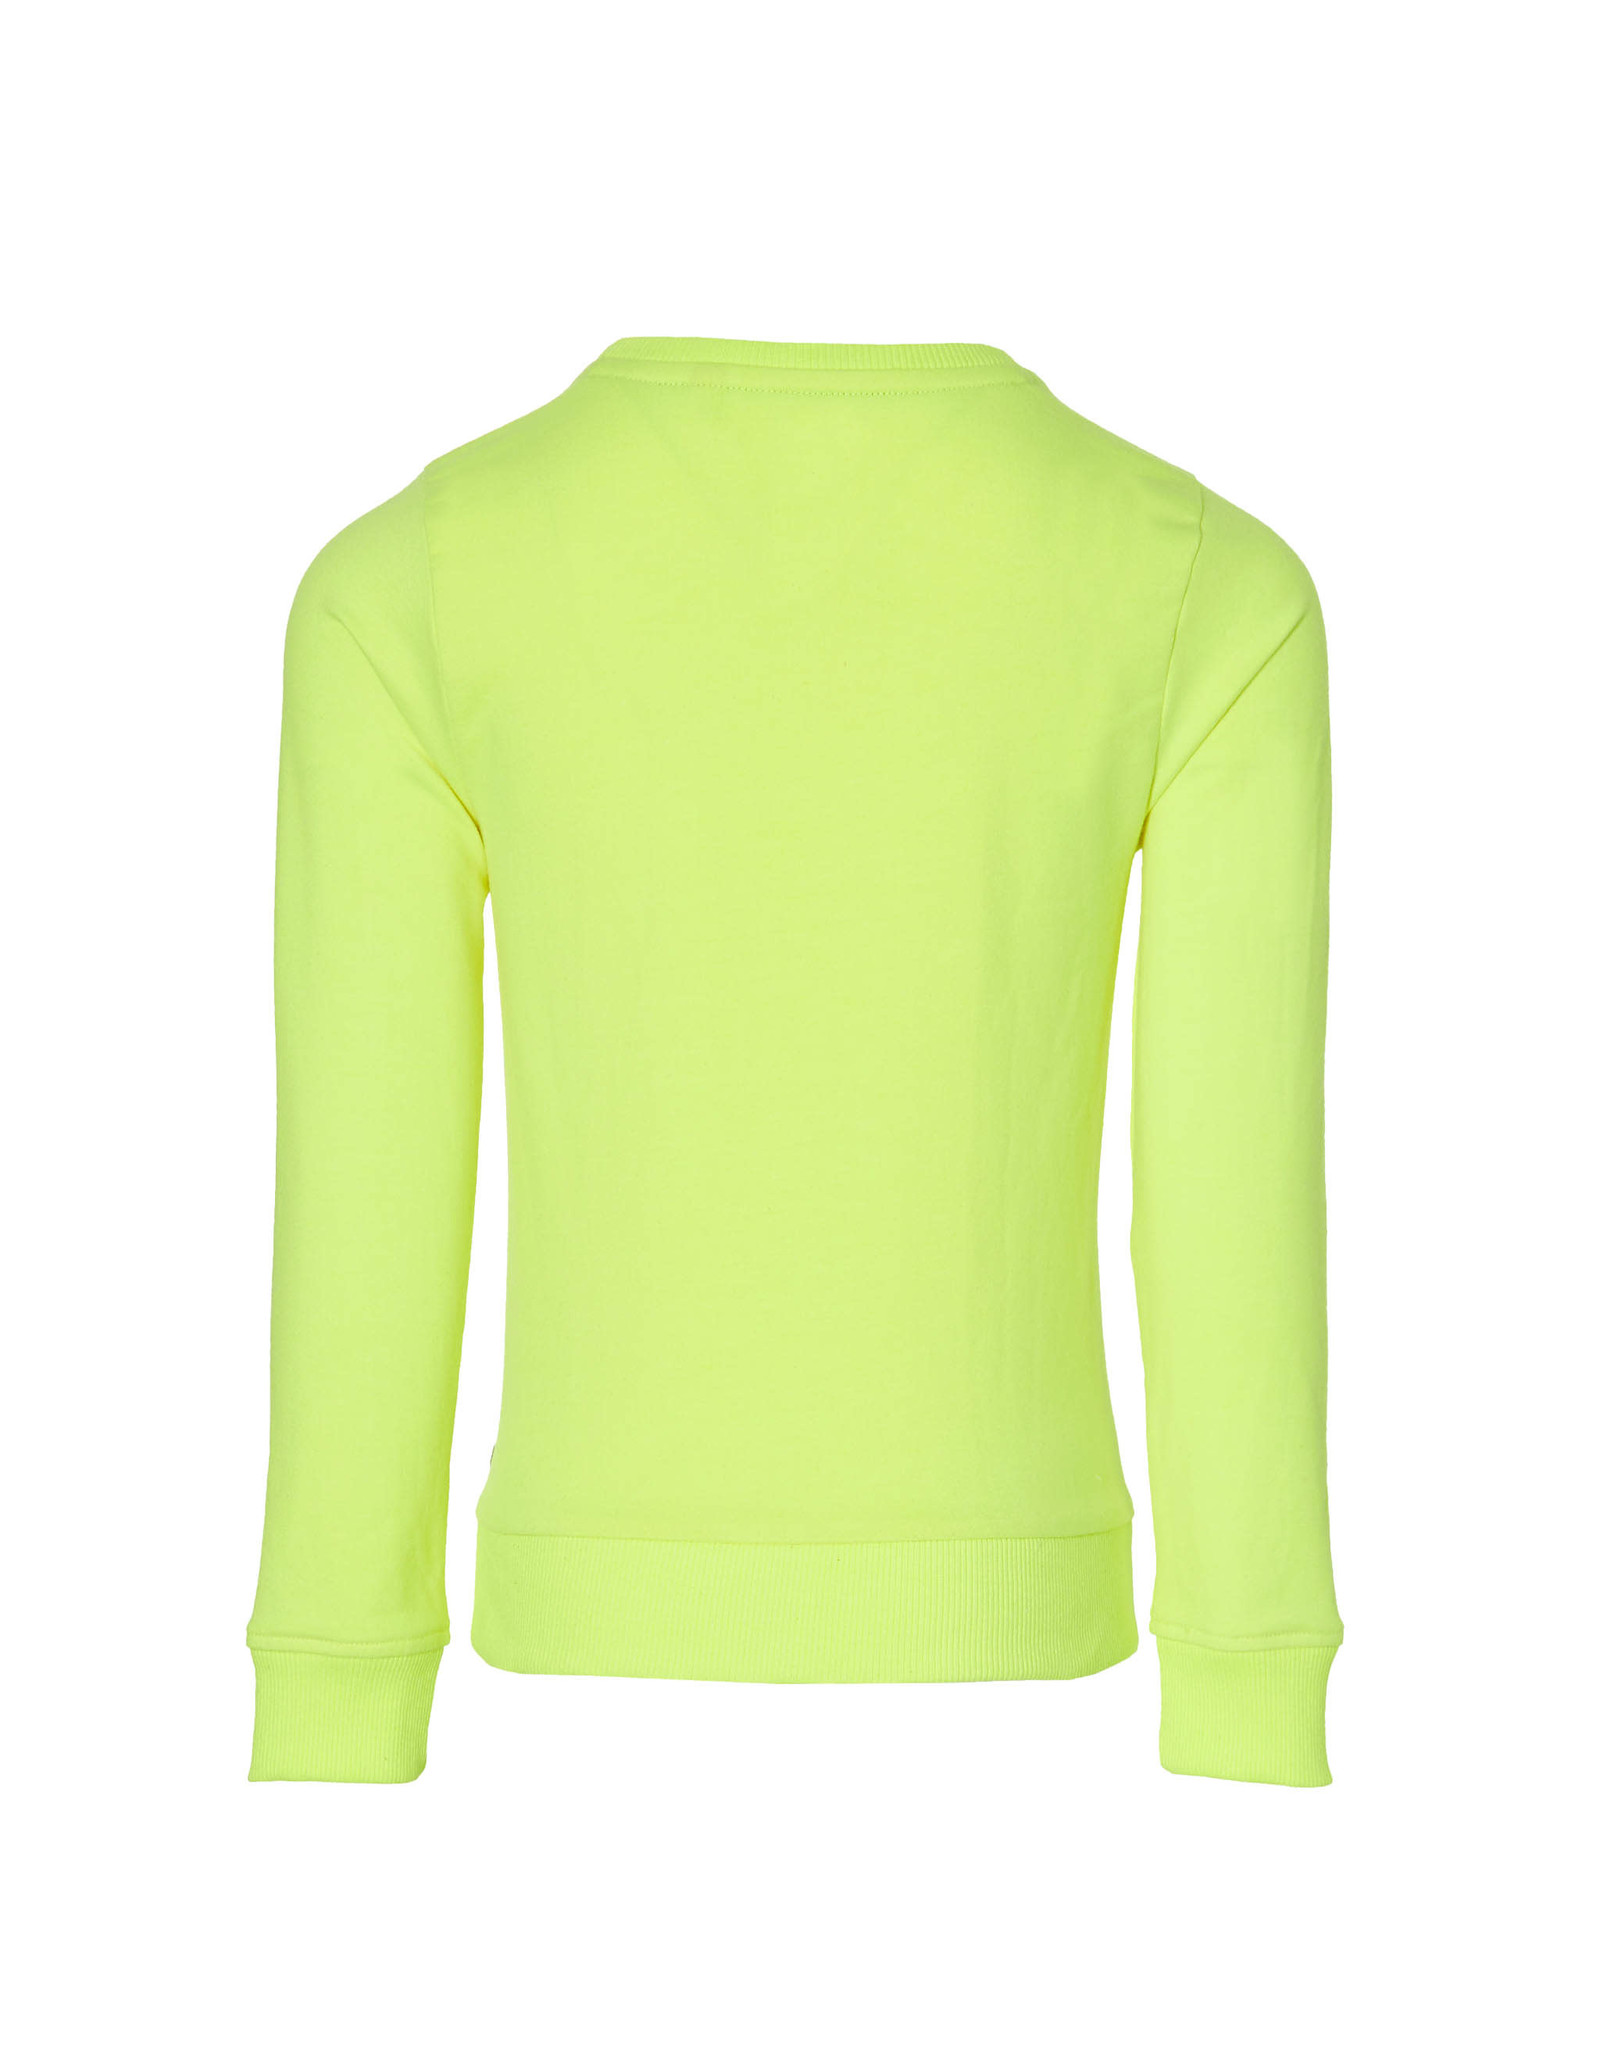 Quapi Quapi meisjes sweater Davita Yellow